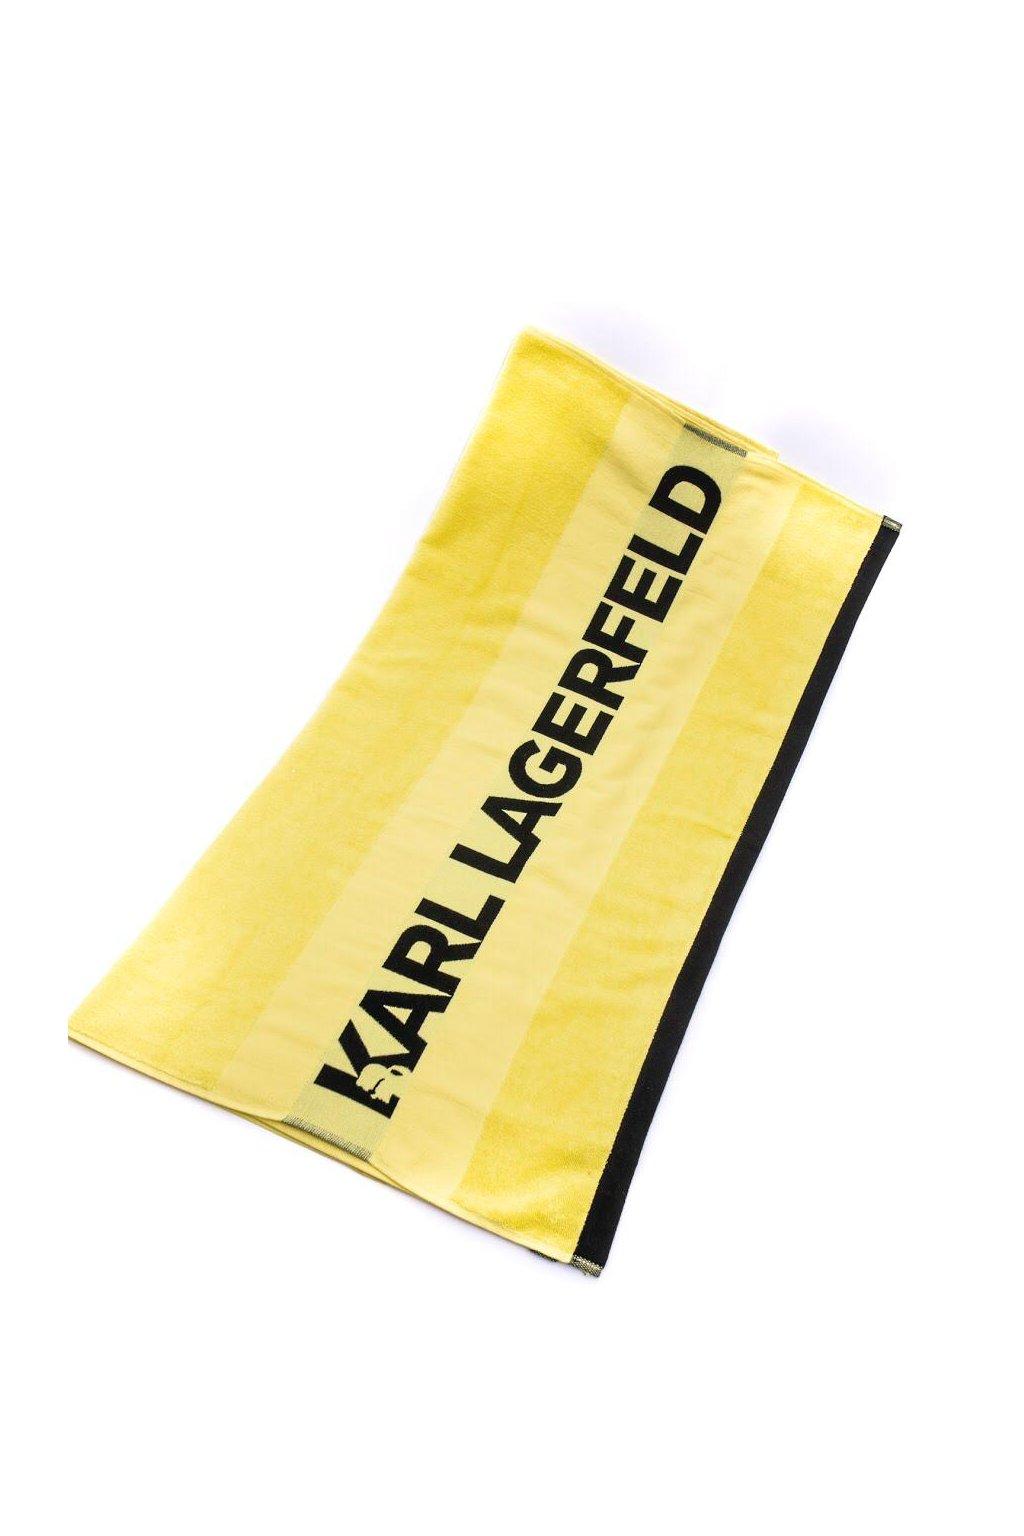 Plazovy rucnik Karl Lagerfeld zluty (1)